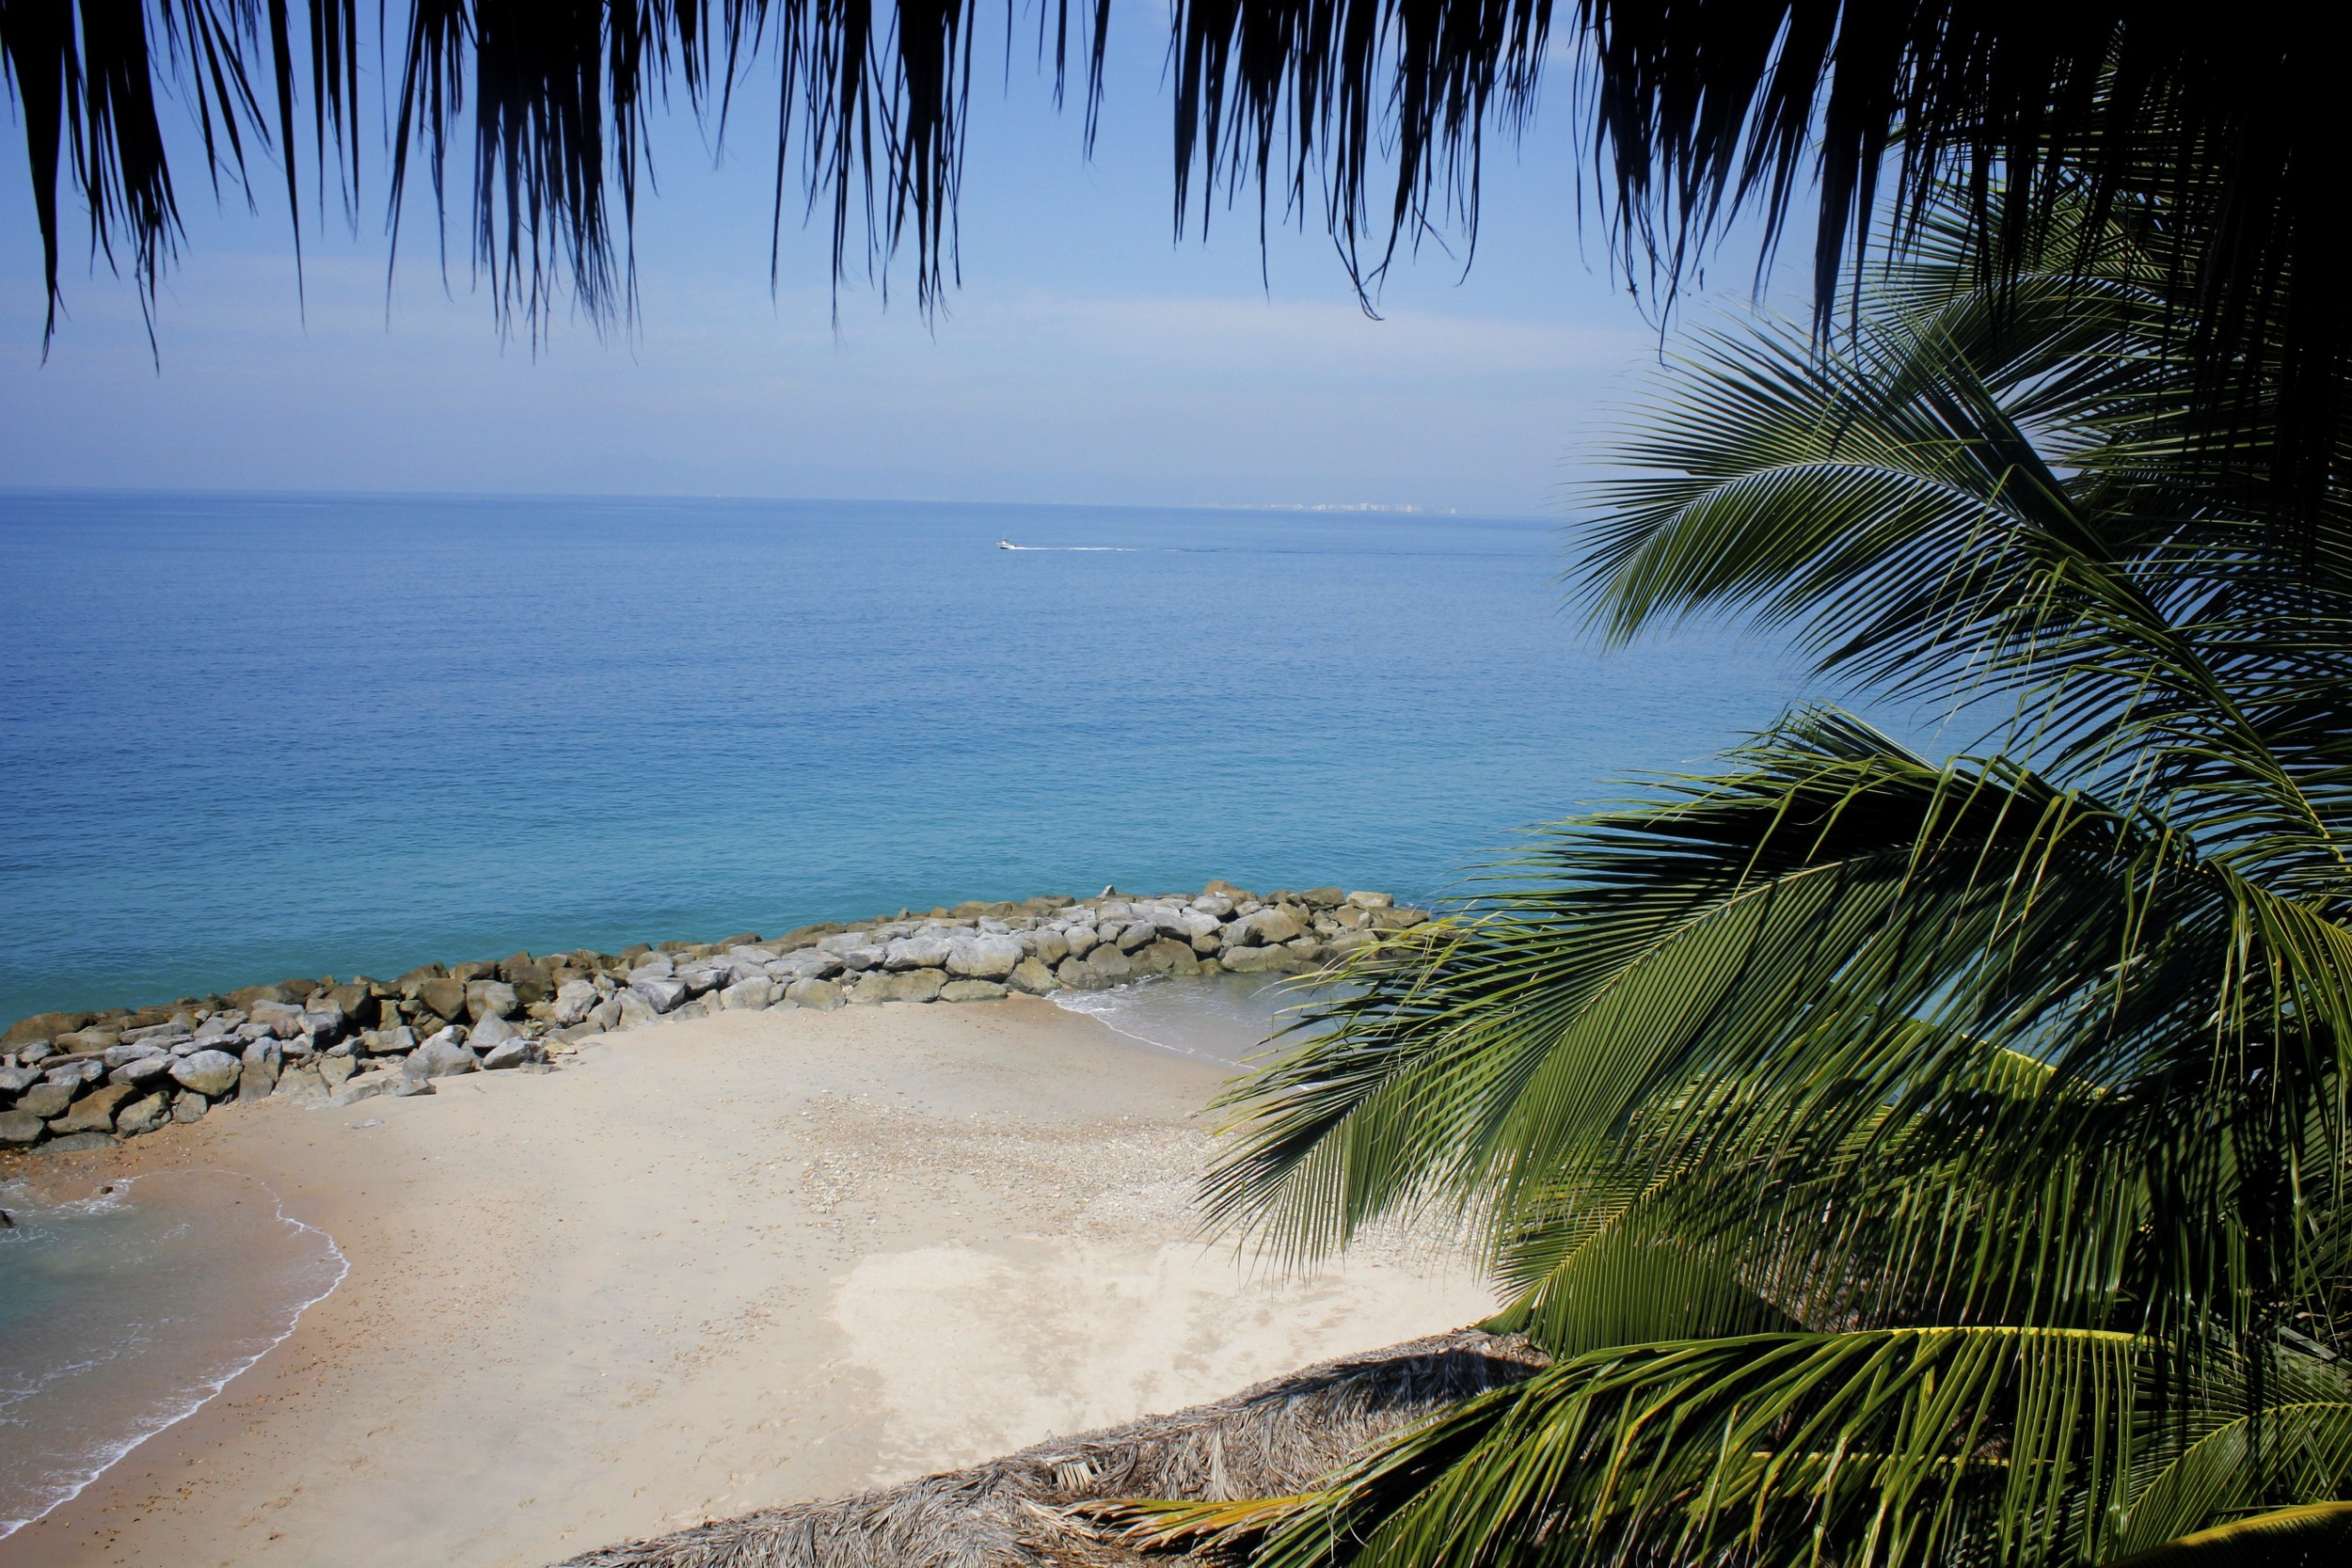 paradise found.